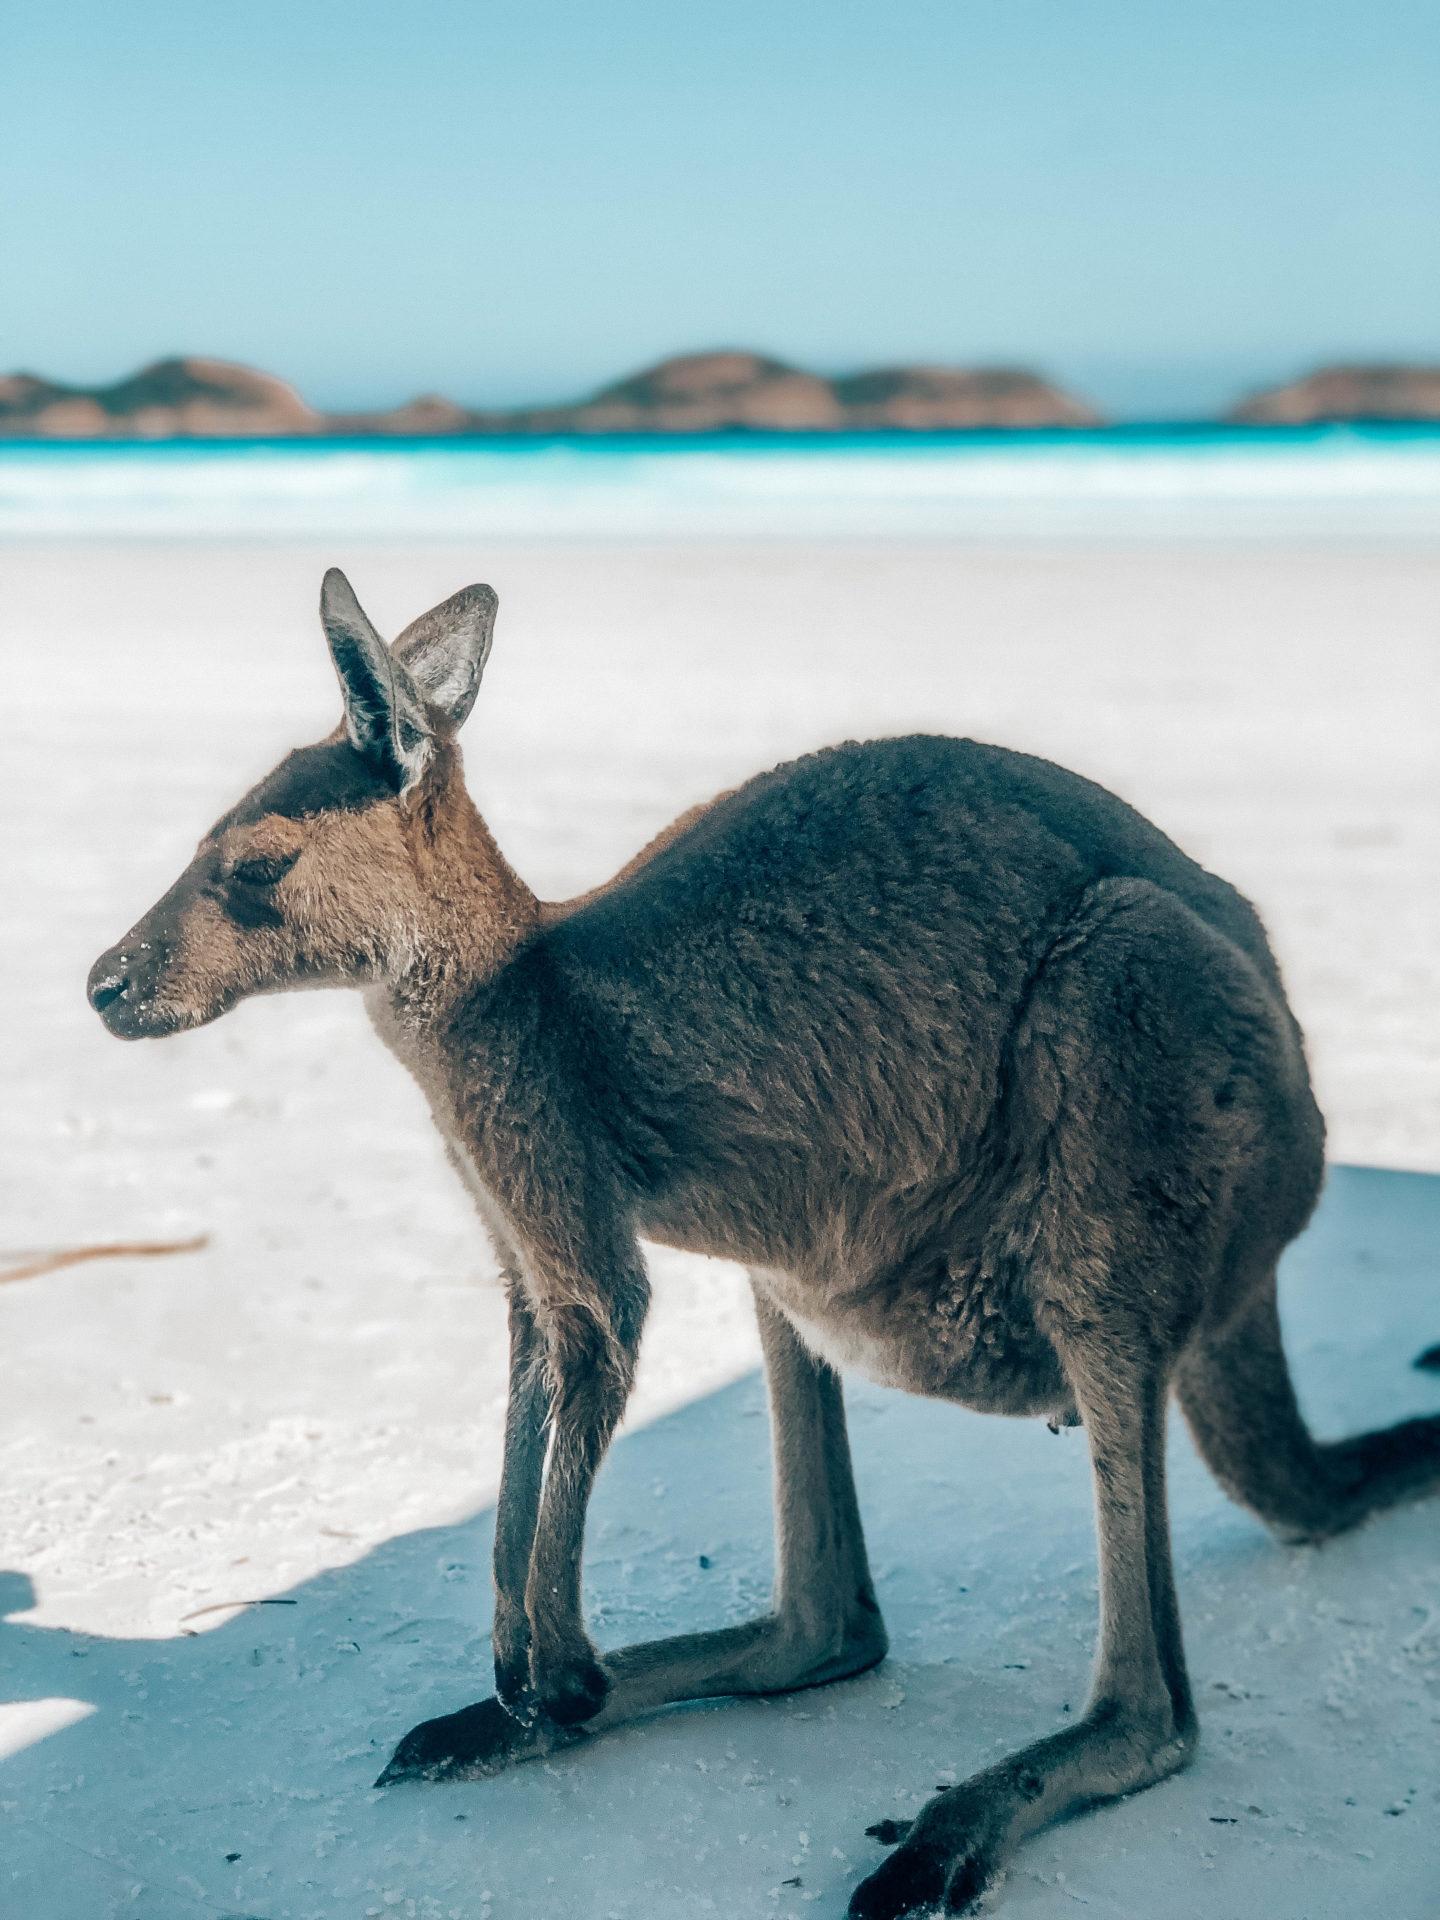 Où voir des Kangourous en Australie - Blondie Baby blog mode et voyages